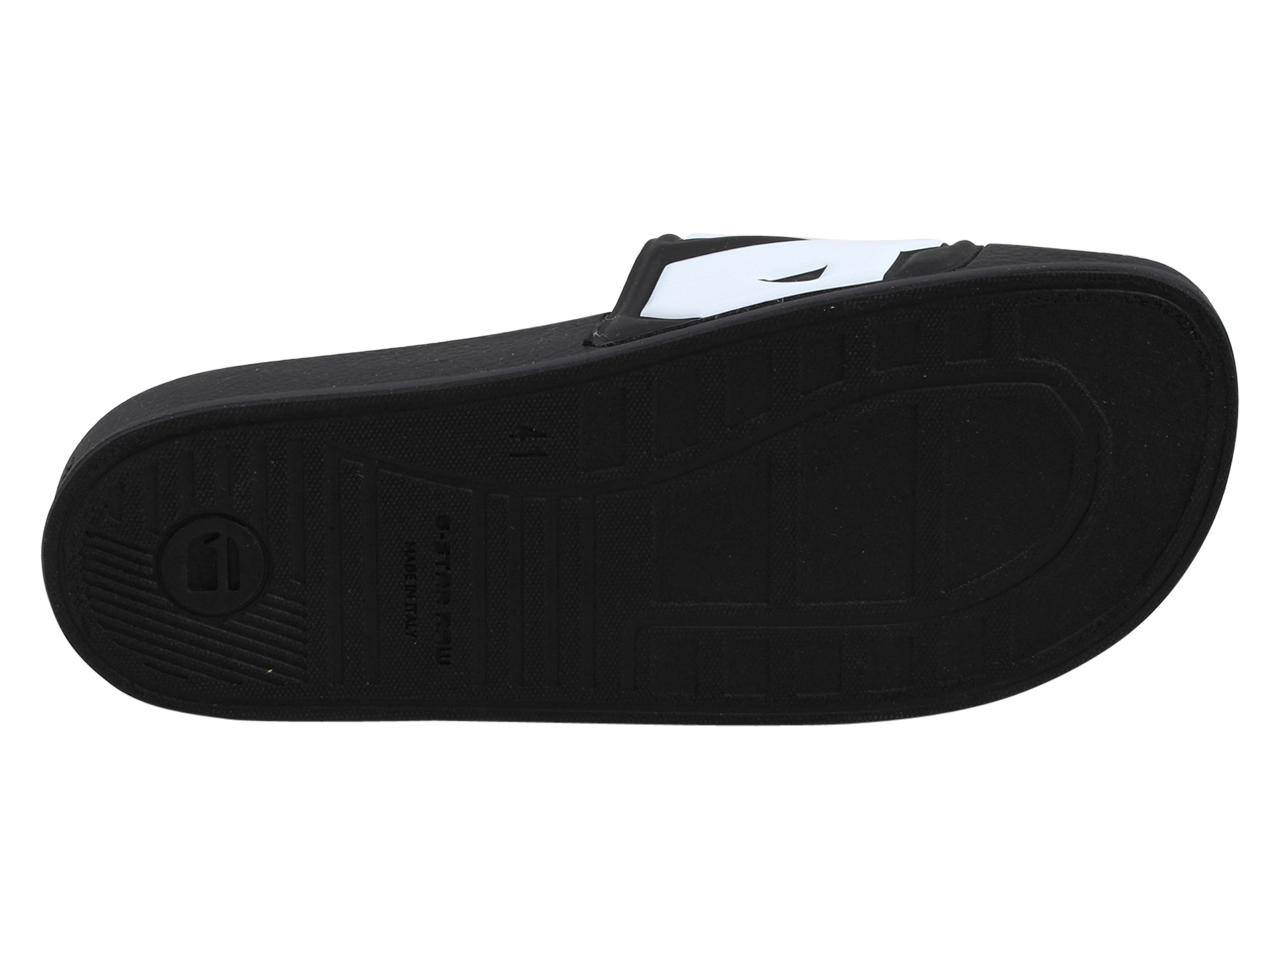 bc0ac4db96bf G-Star Raw Men s Cart-Slide-II Slides Sandals Shoes